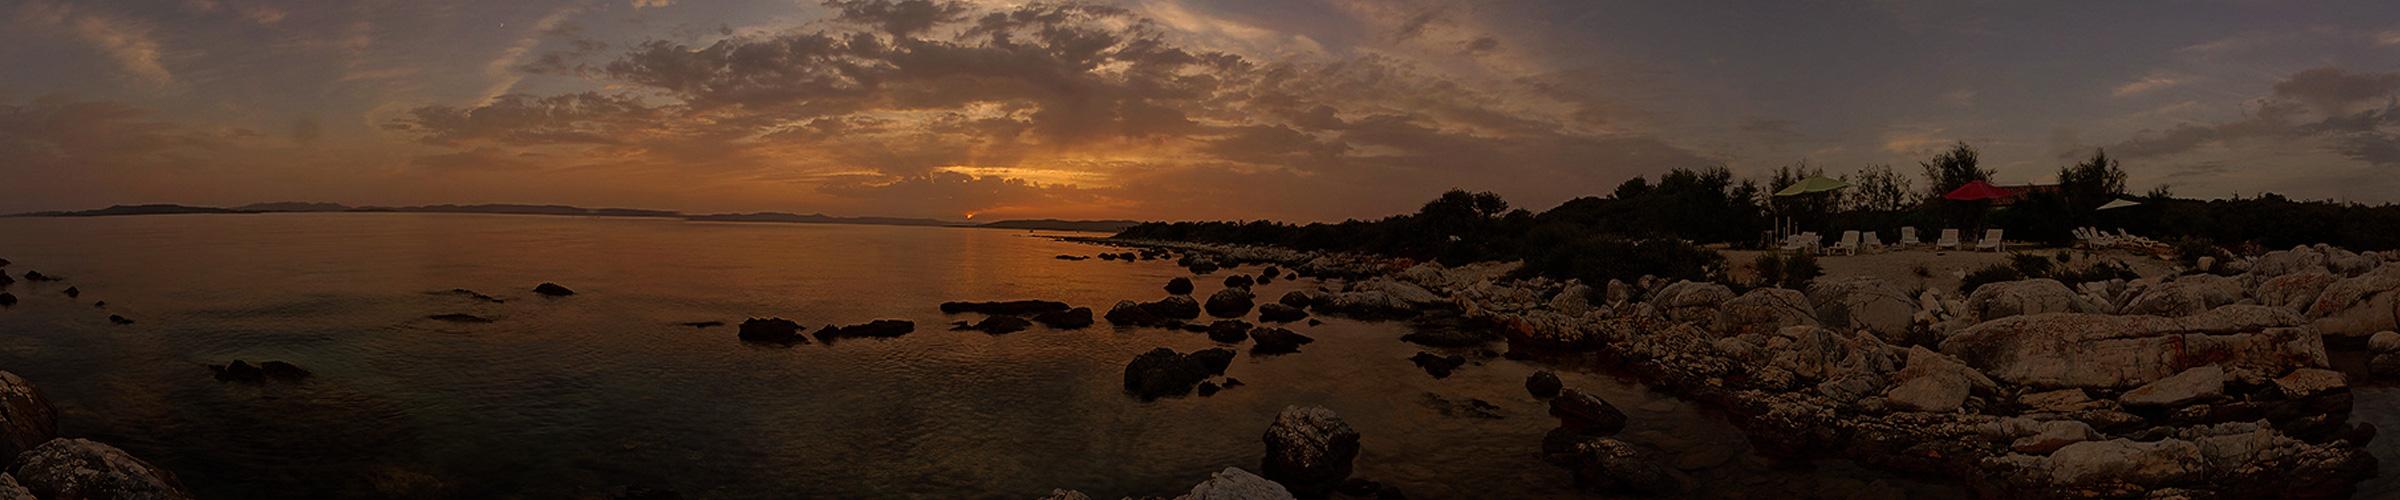 Guduce villas - sunset.jpg